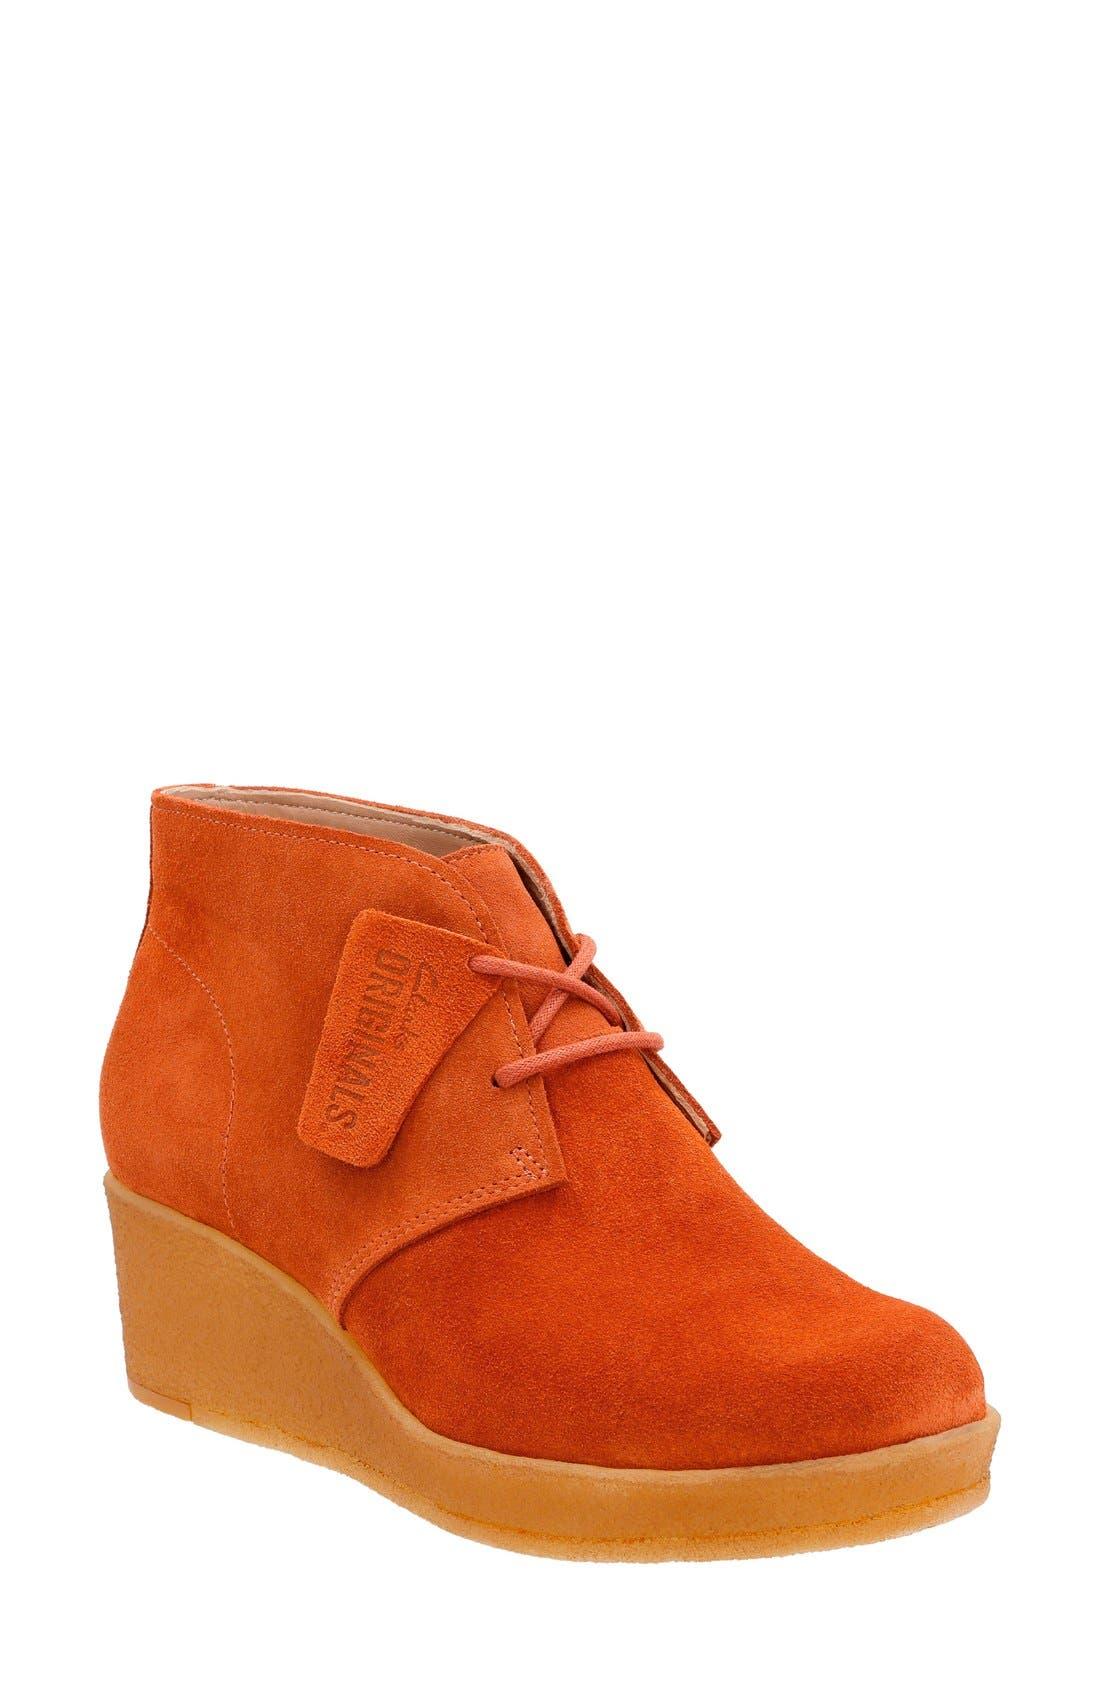 Main Image - Clarks® Originals 'Athie Terra' Wedge Boot (Women)